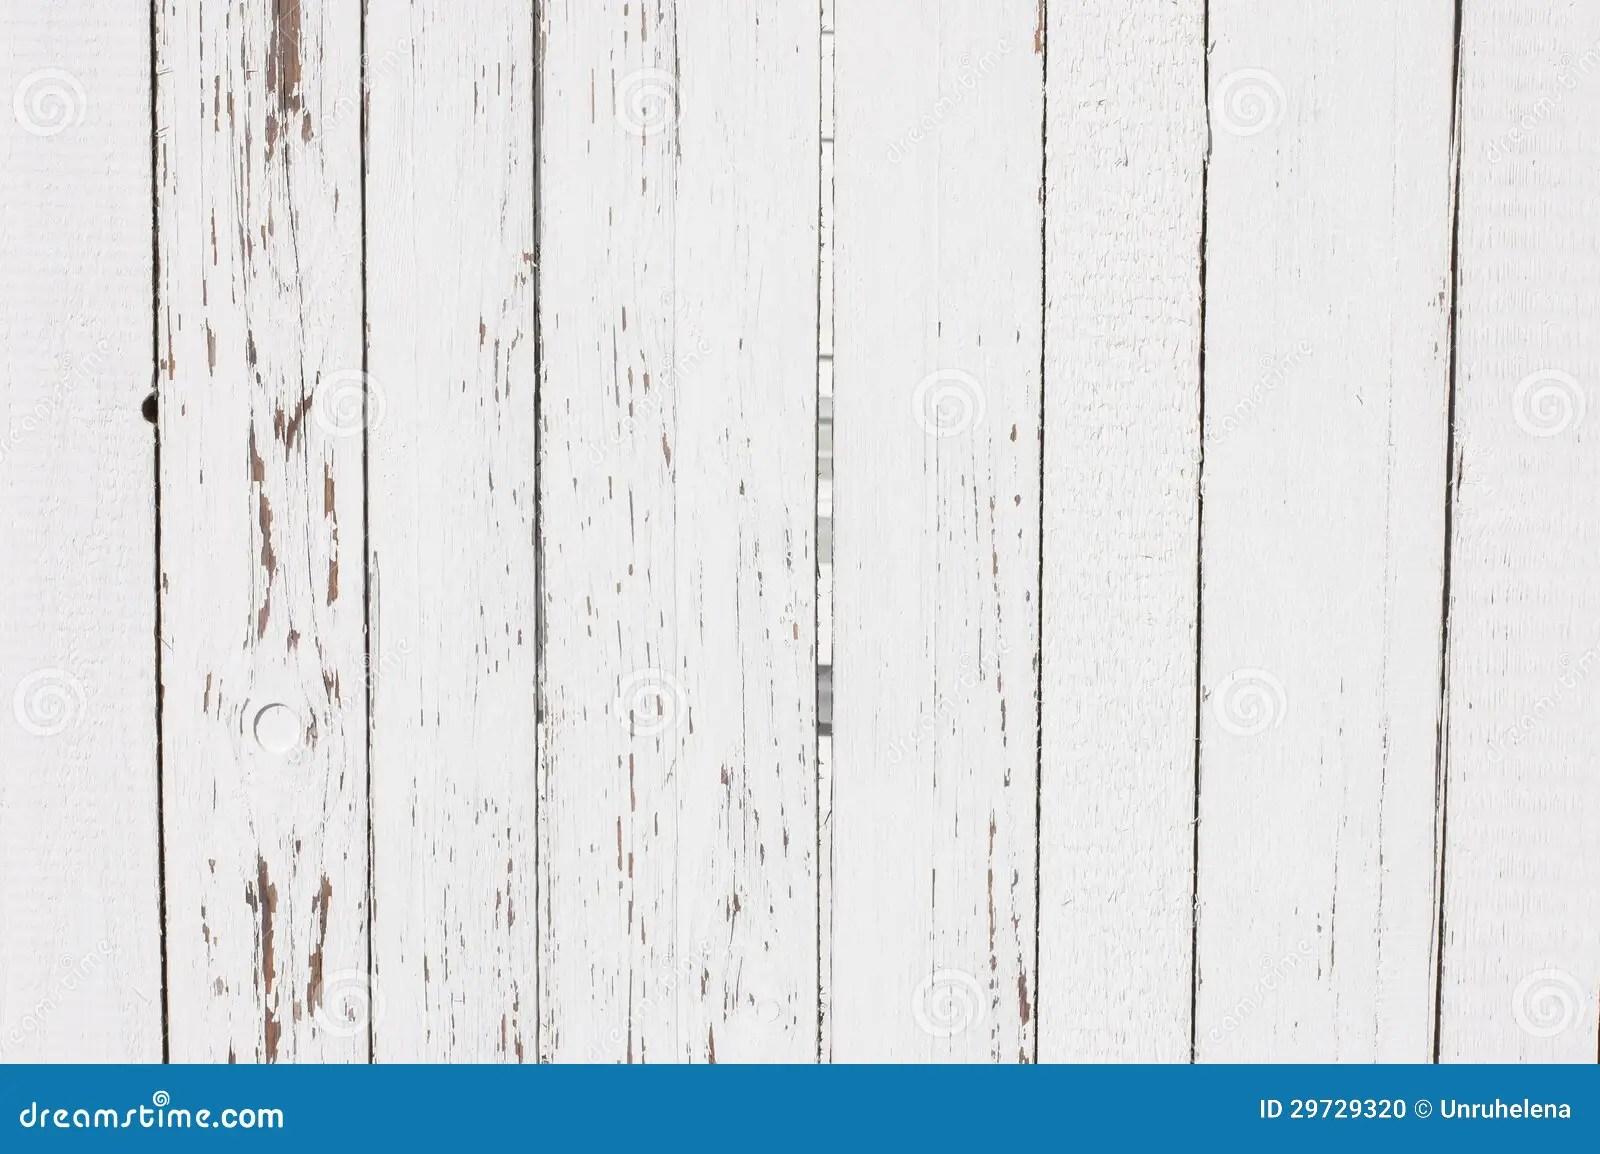 White Wooden Planks Texturertical Stock Photo